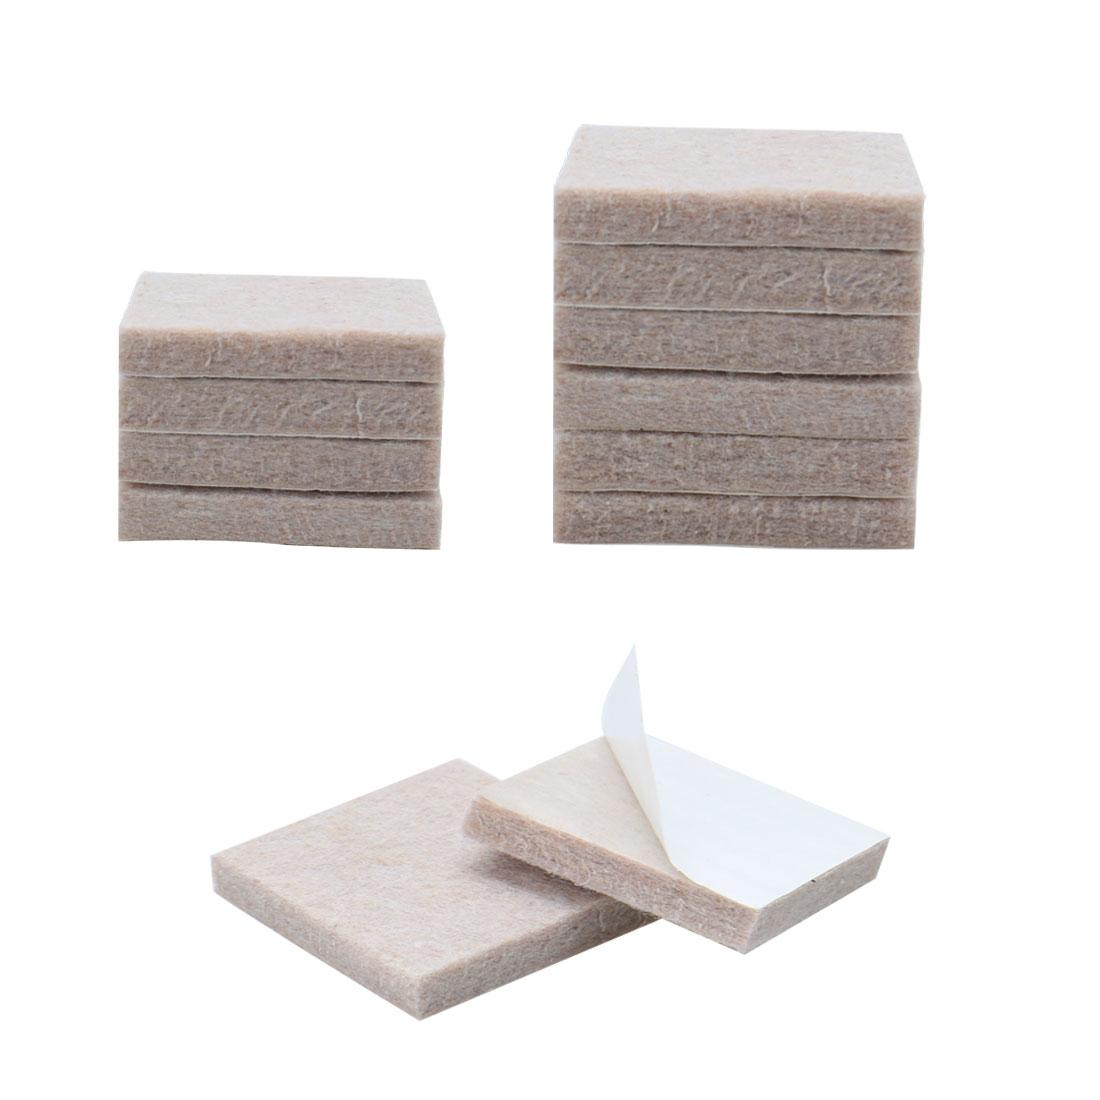 "Furniture Pads Square 1 5/8"" Self-stick for Furniture Floor Protector 12pcs - image 7 de 7"